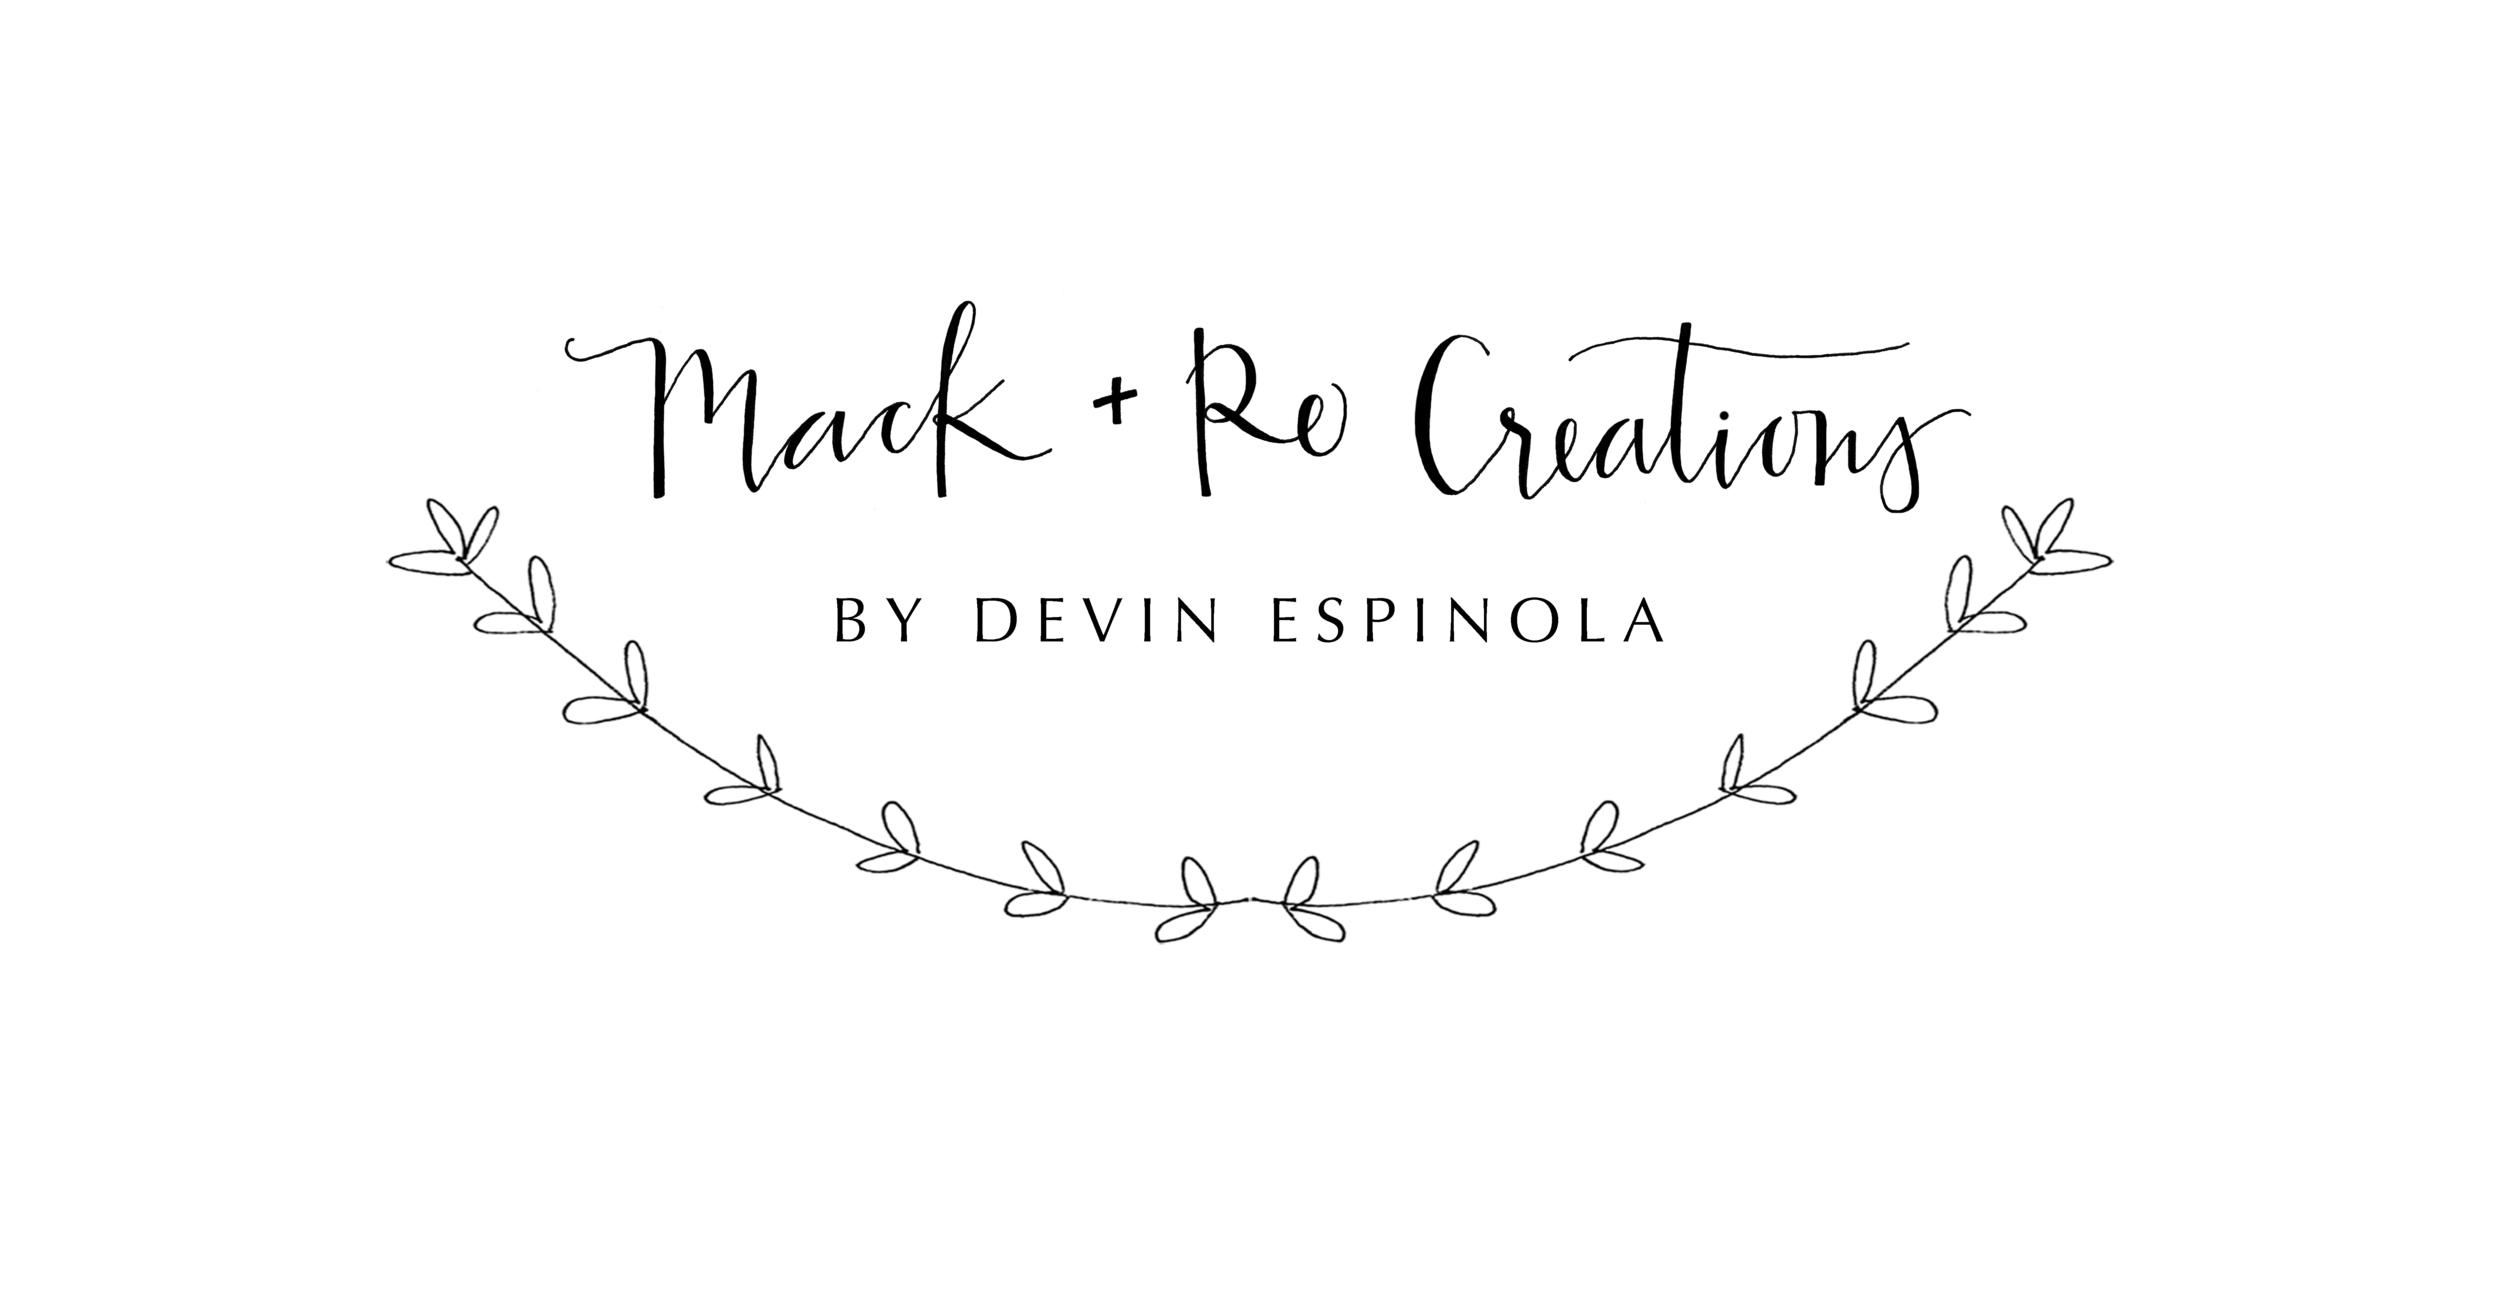 Mack+Ro Creations Logo Large.jpg